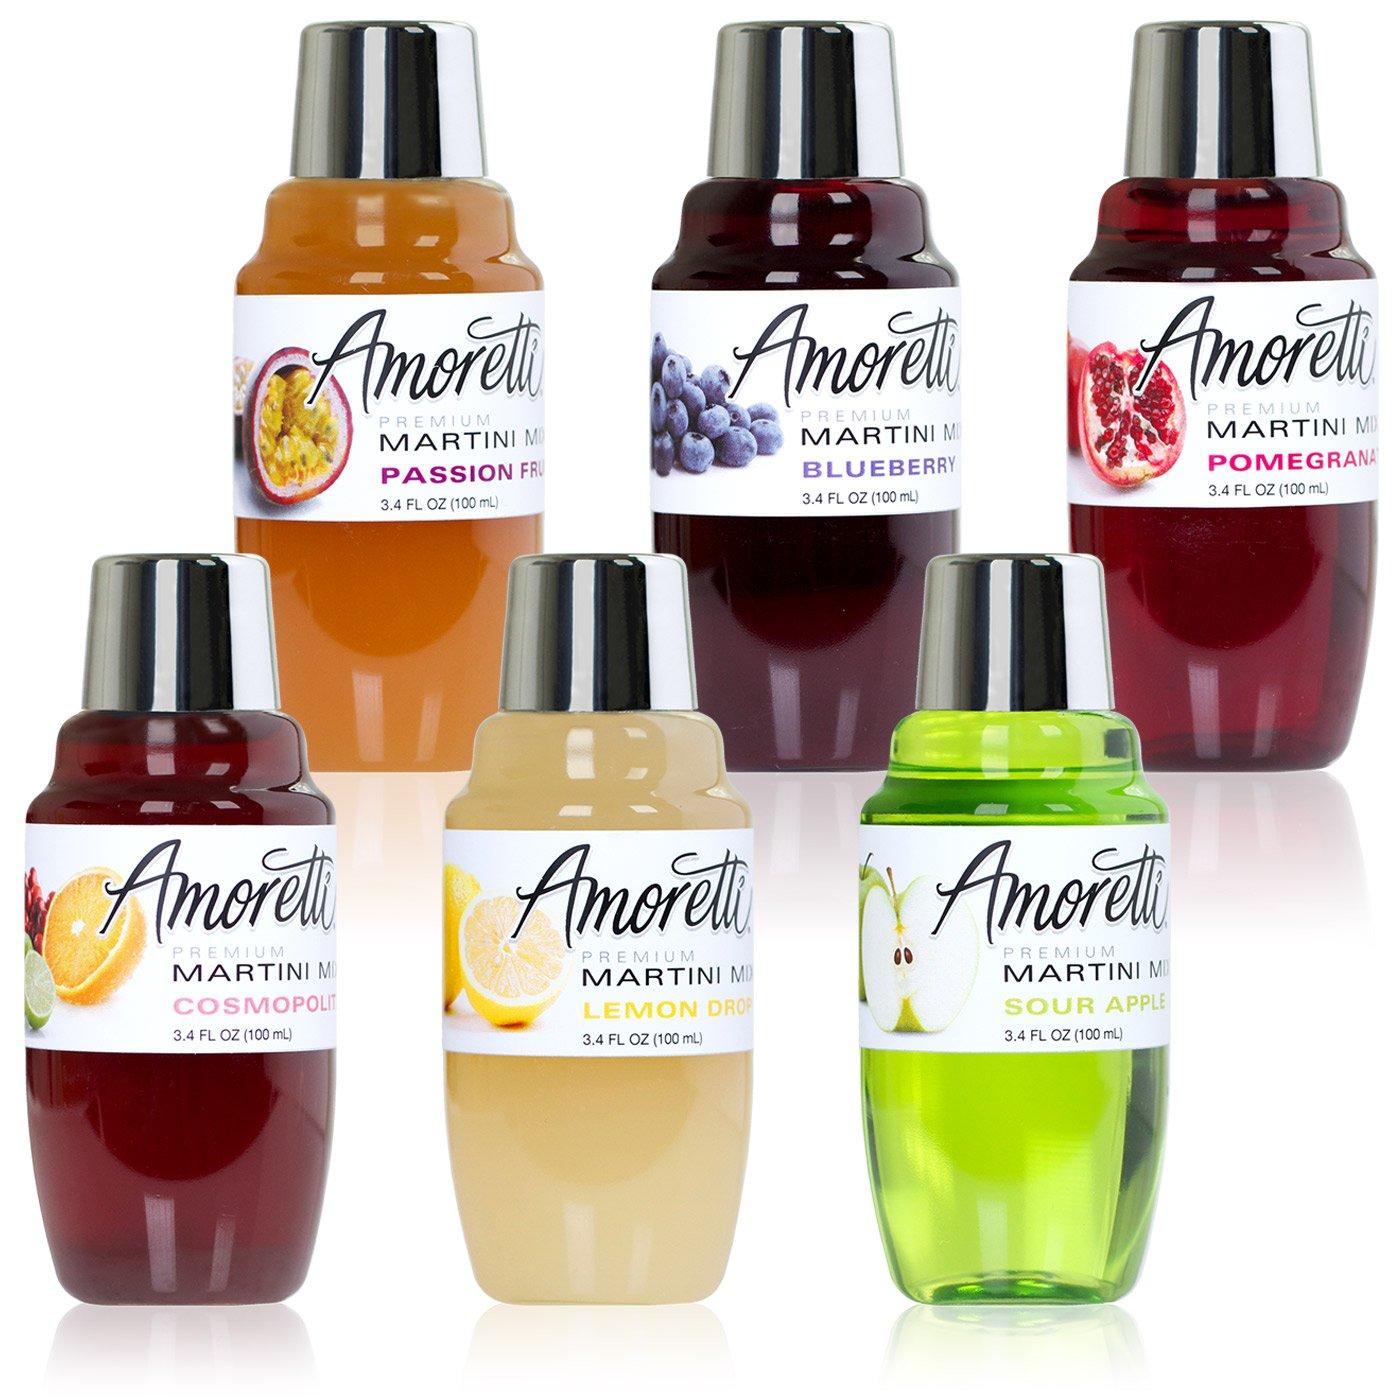 Amoretti Premium Martini Cocktail Mix Minis, 3.4 fl oz 6 Pack by Amoretti